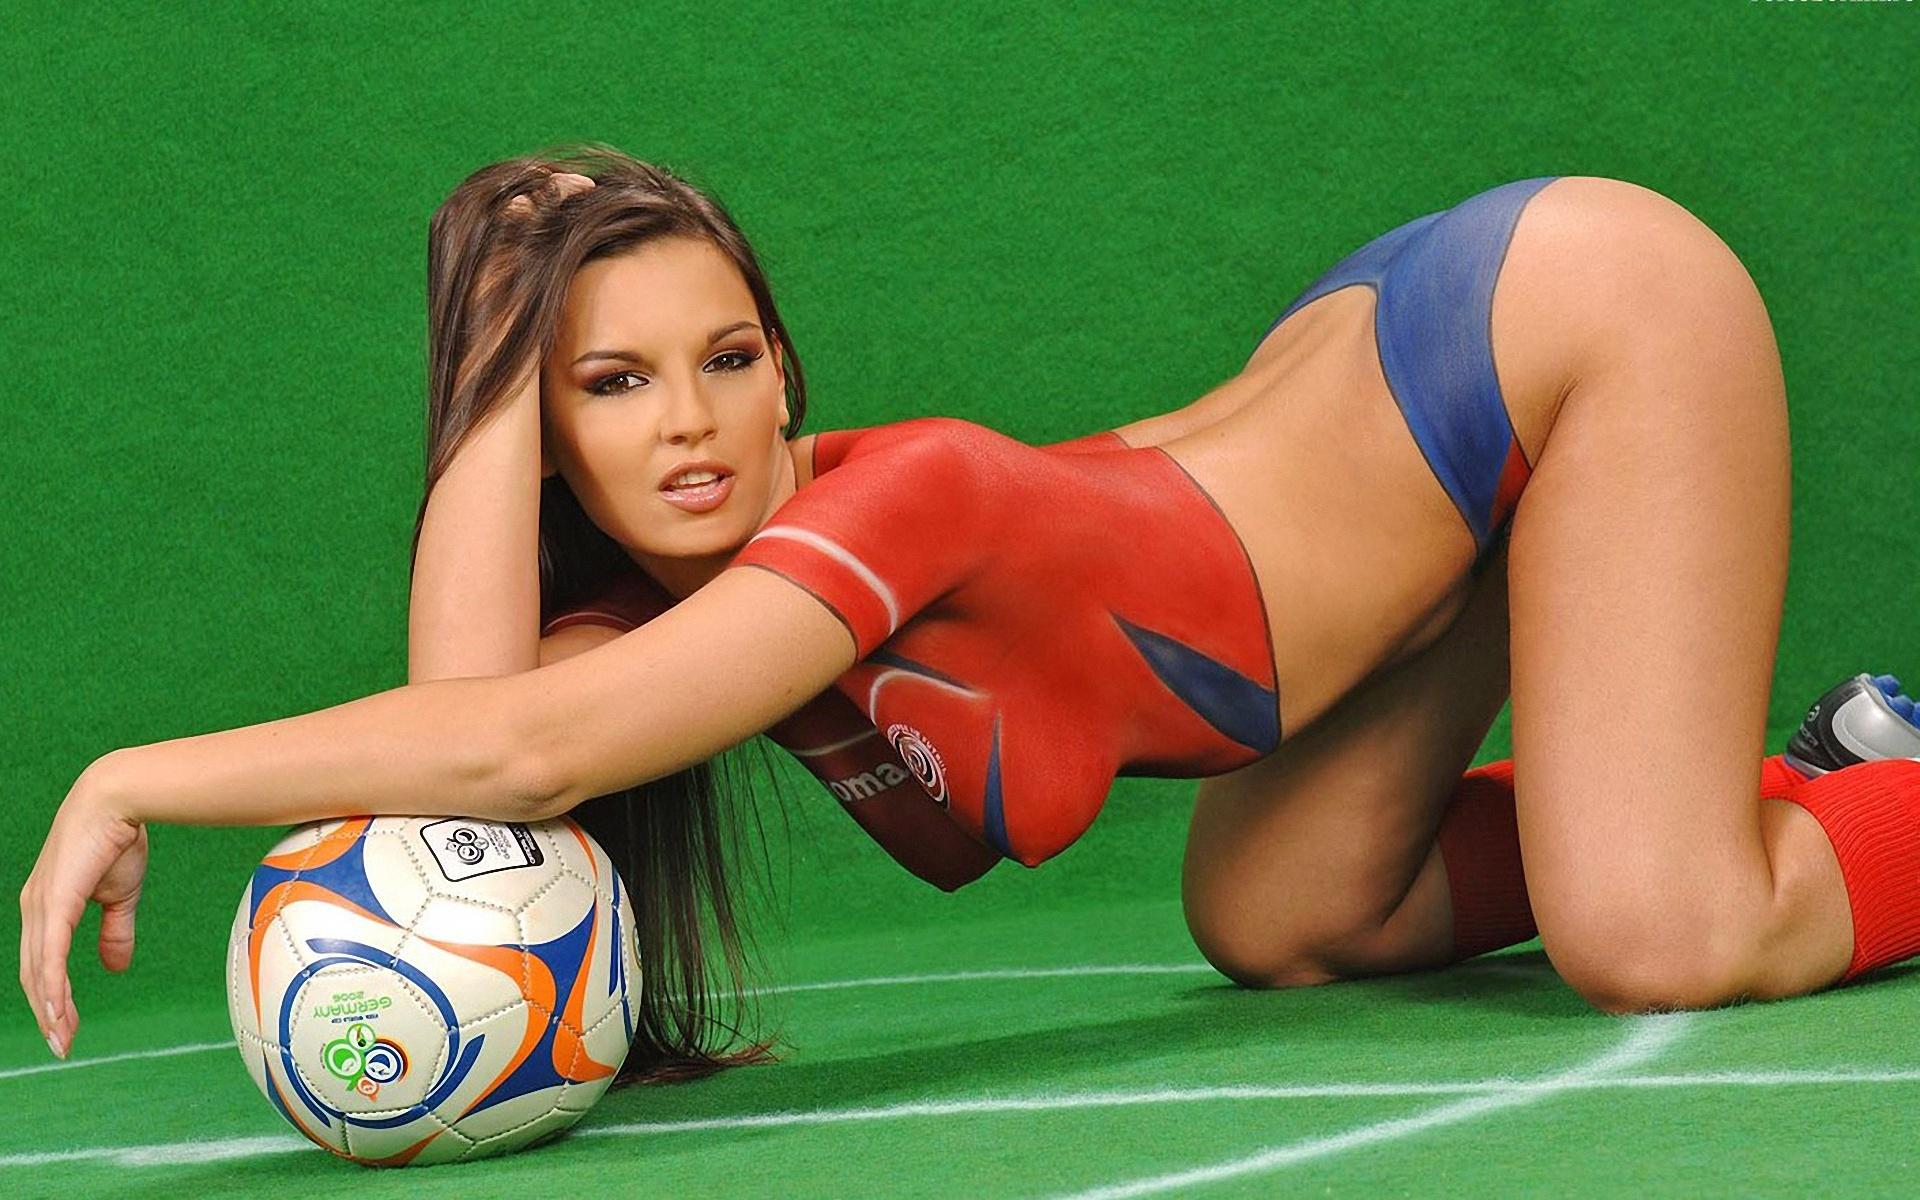 Секс фото футбалисток 13 фотография